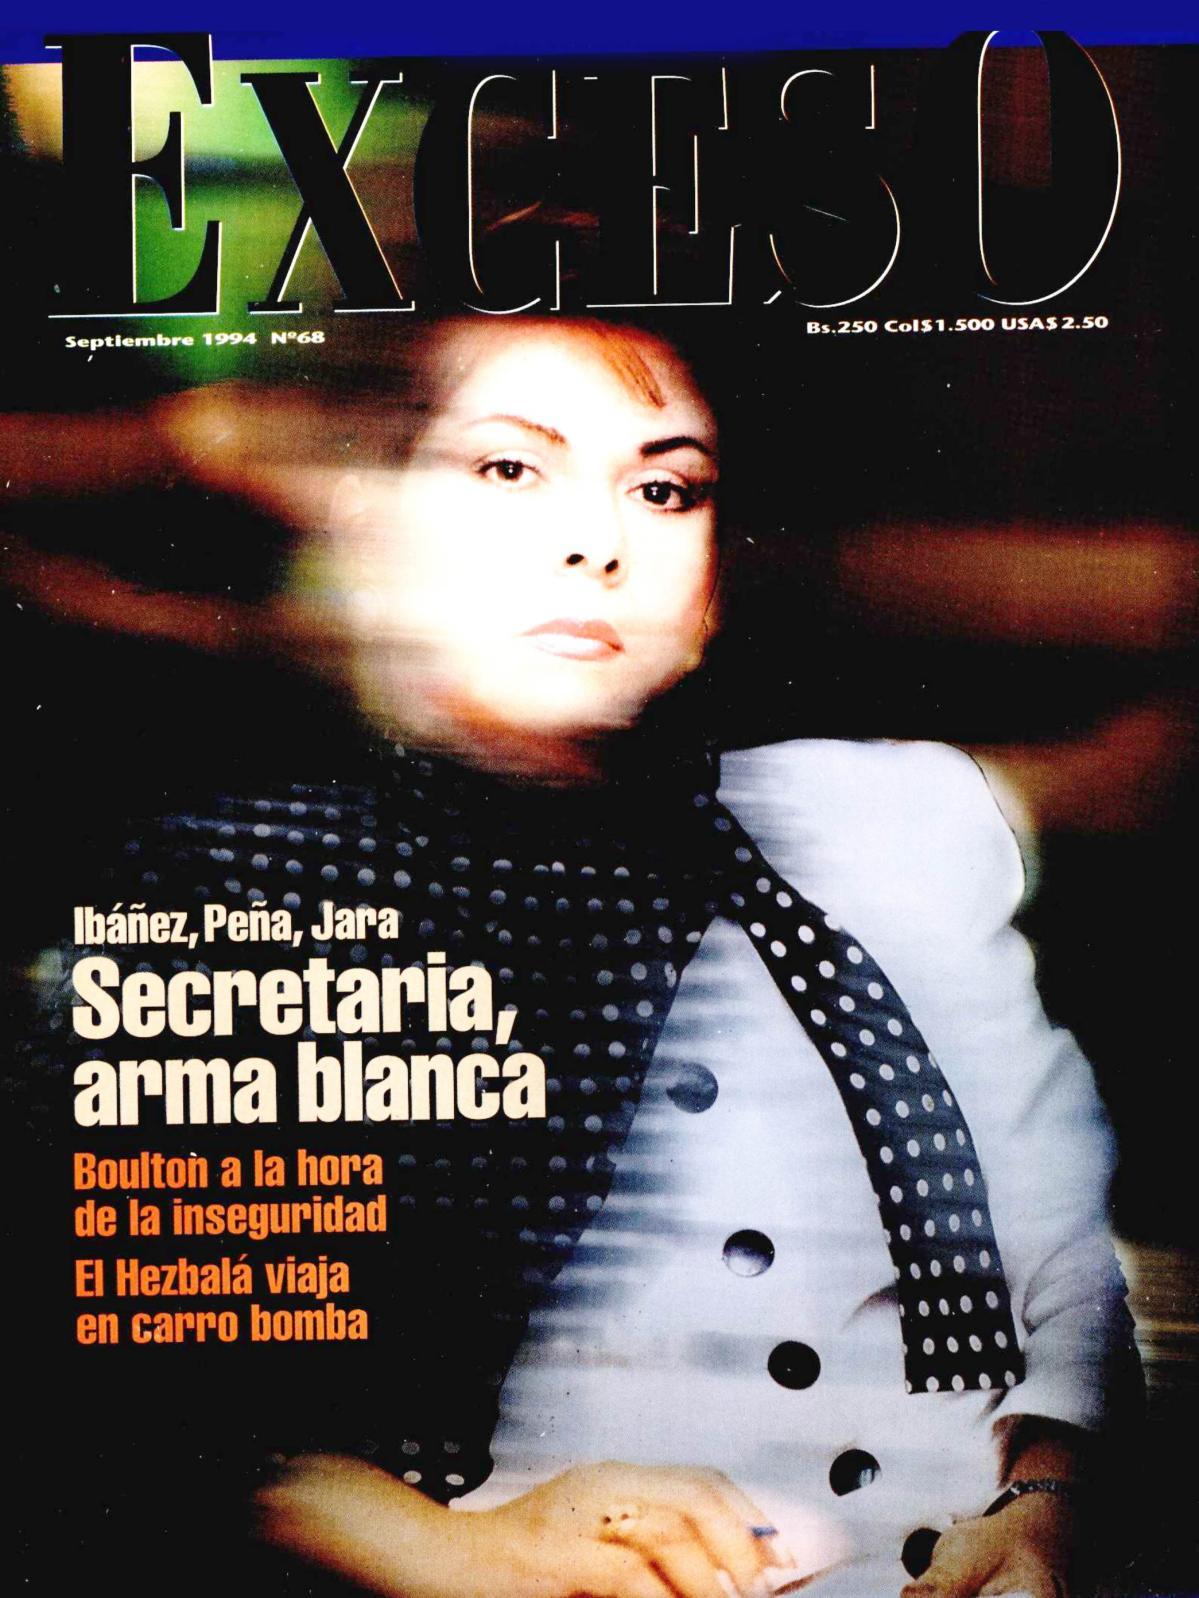 Anastasia Mayo Peliculas calaméo - revista exceso edicion nº 68 septiembre 1994